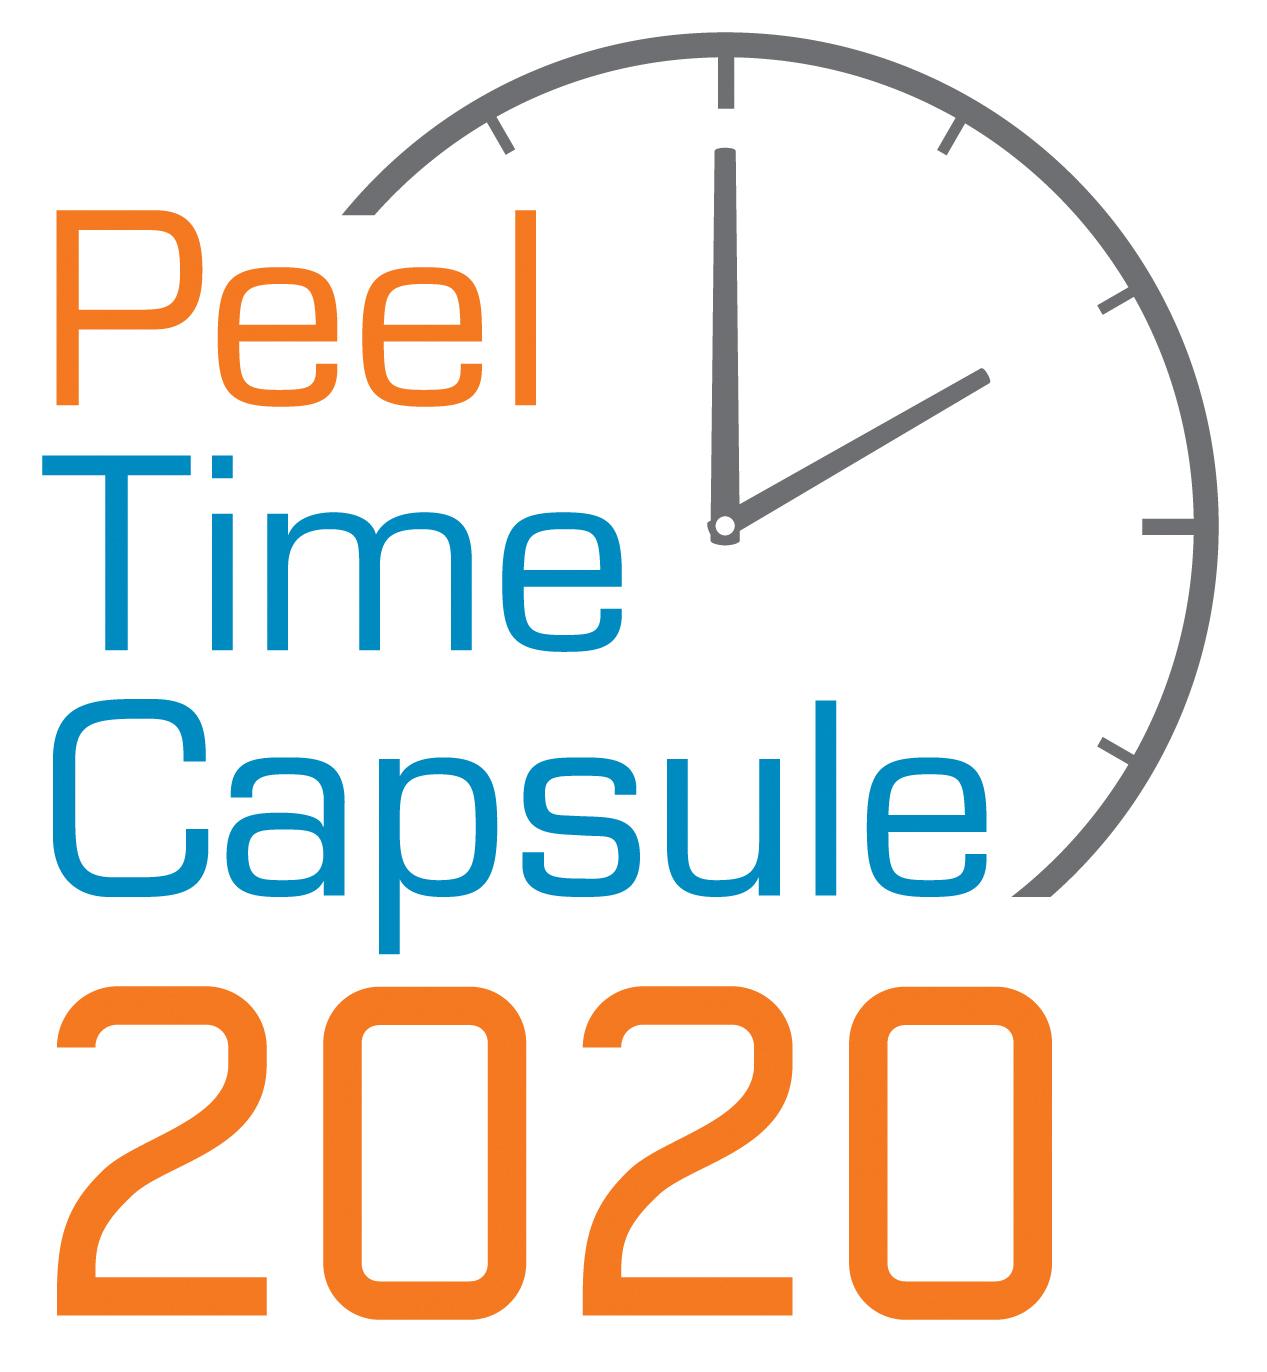 Peel Time Capsule 2020 graphic